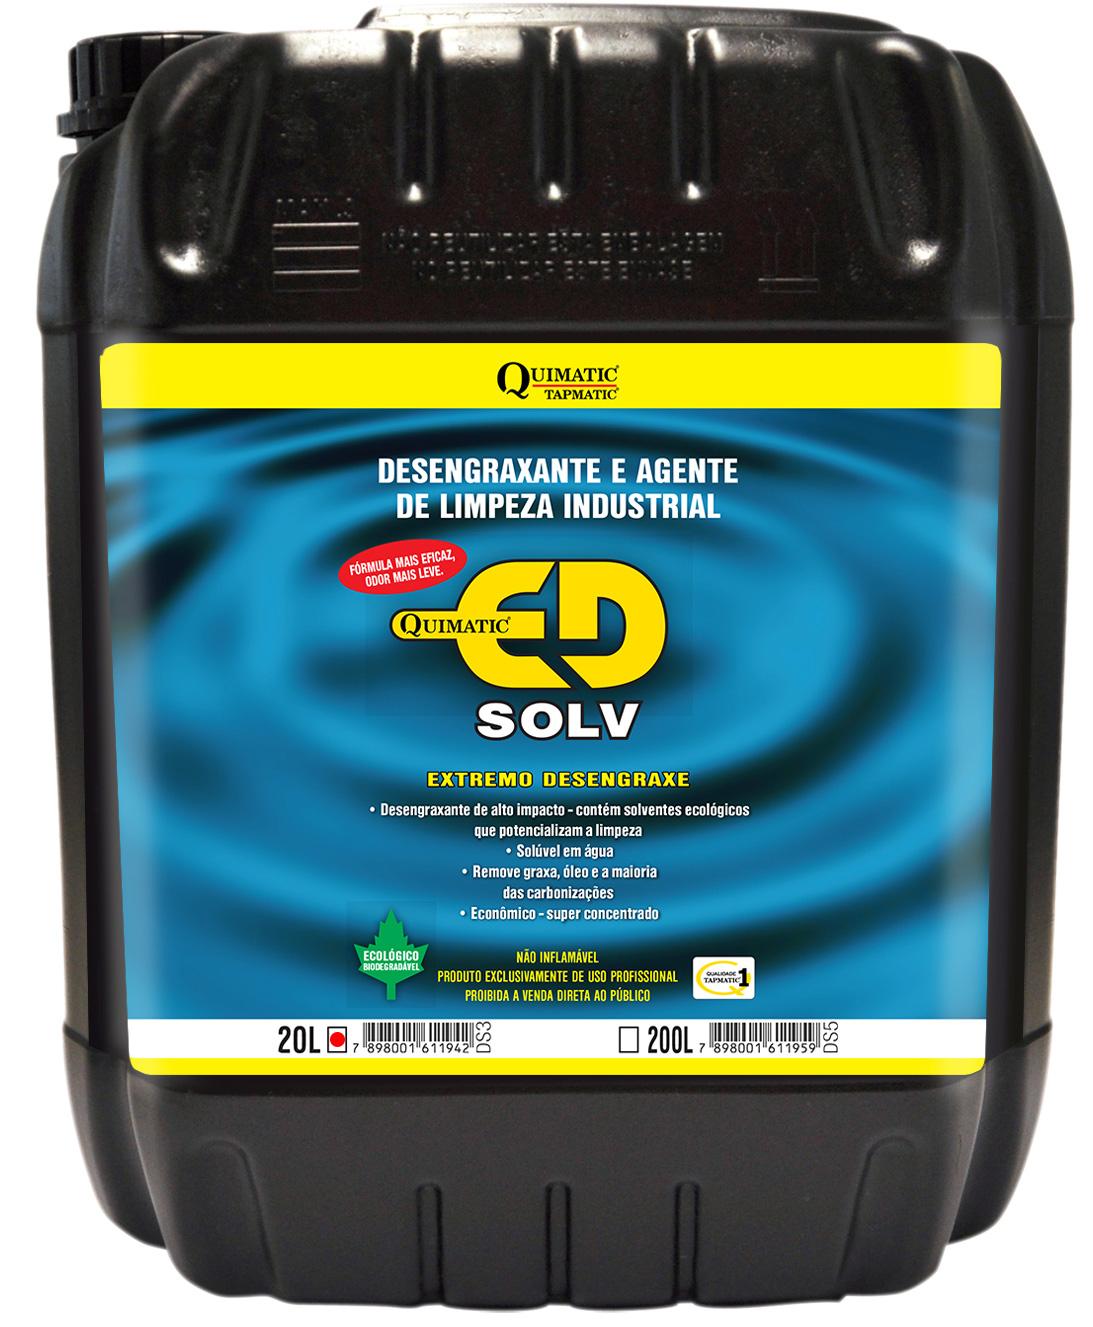 Desengraxante Quimatic ED SOLV 20 Litros